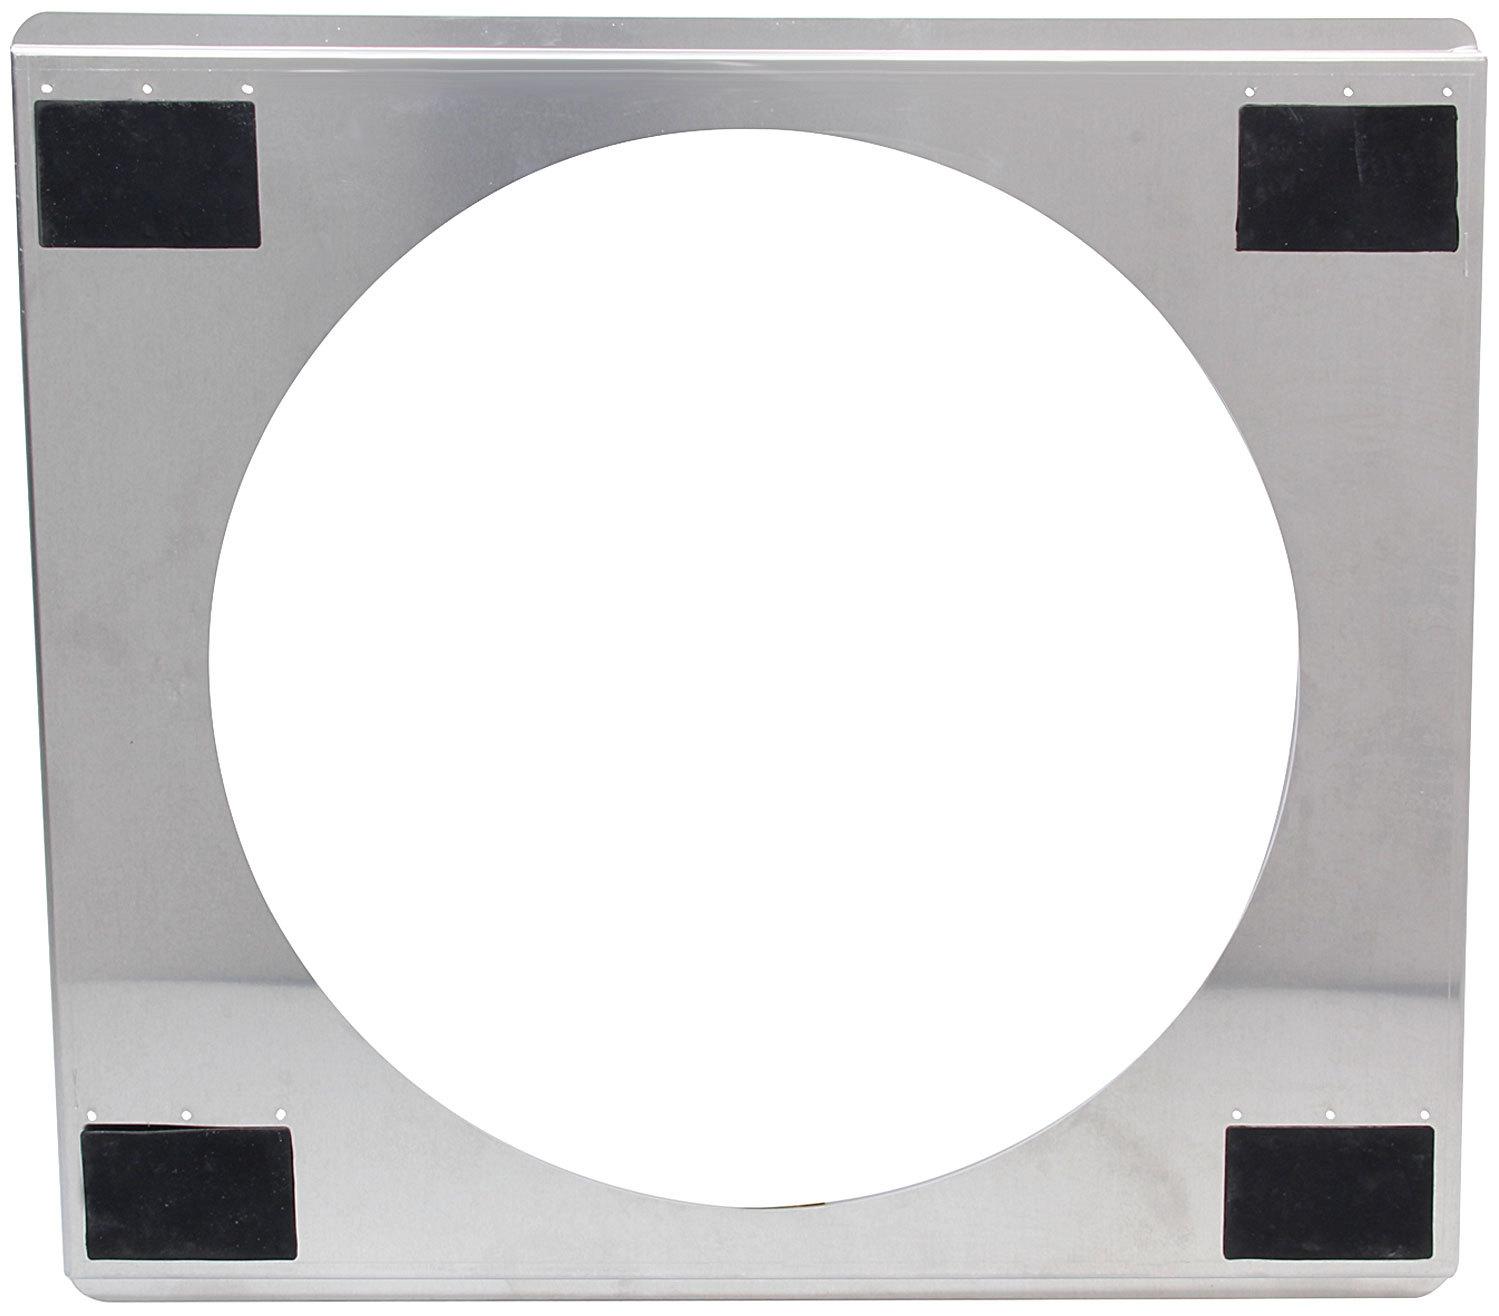 Allstar Performance Aluminum Fan Shroud 18-3/4x18-3/4 Single 16